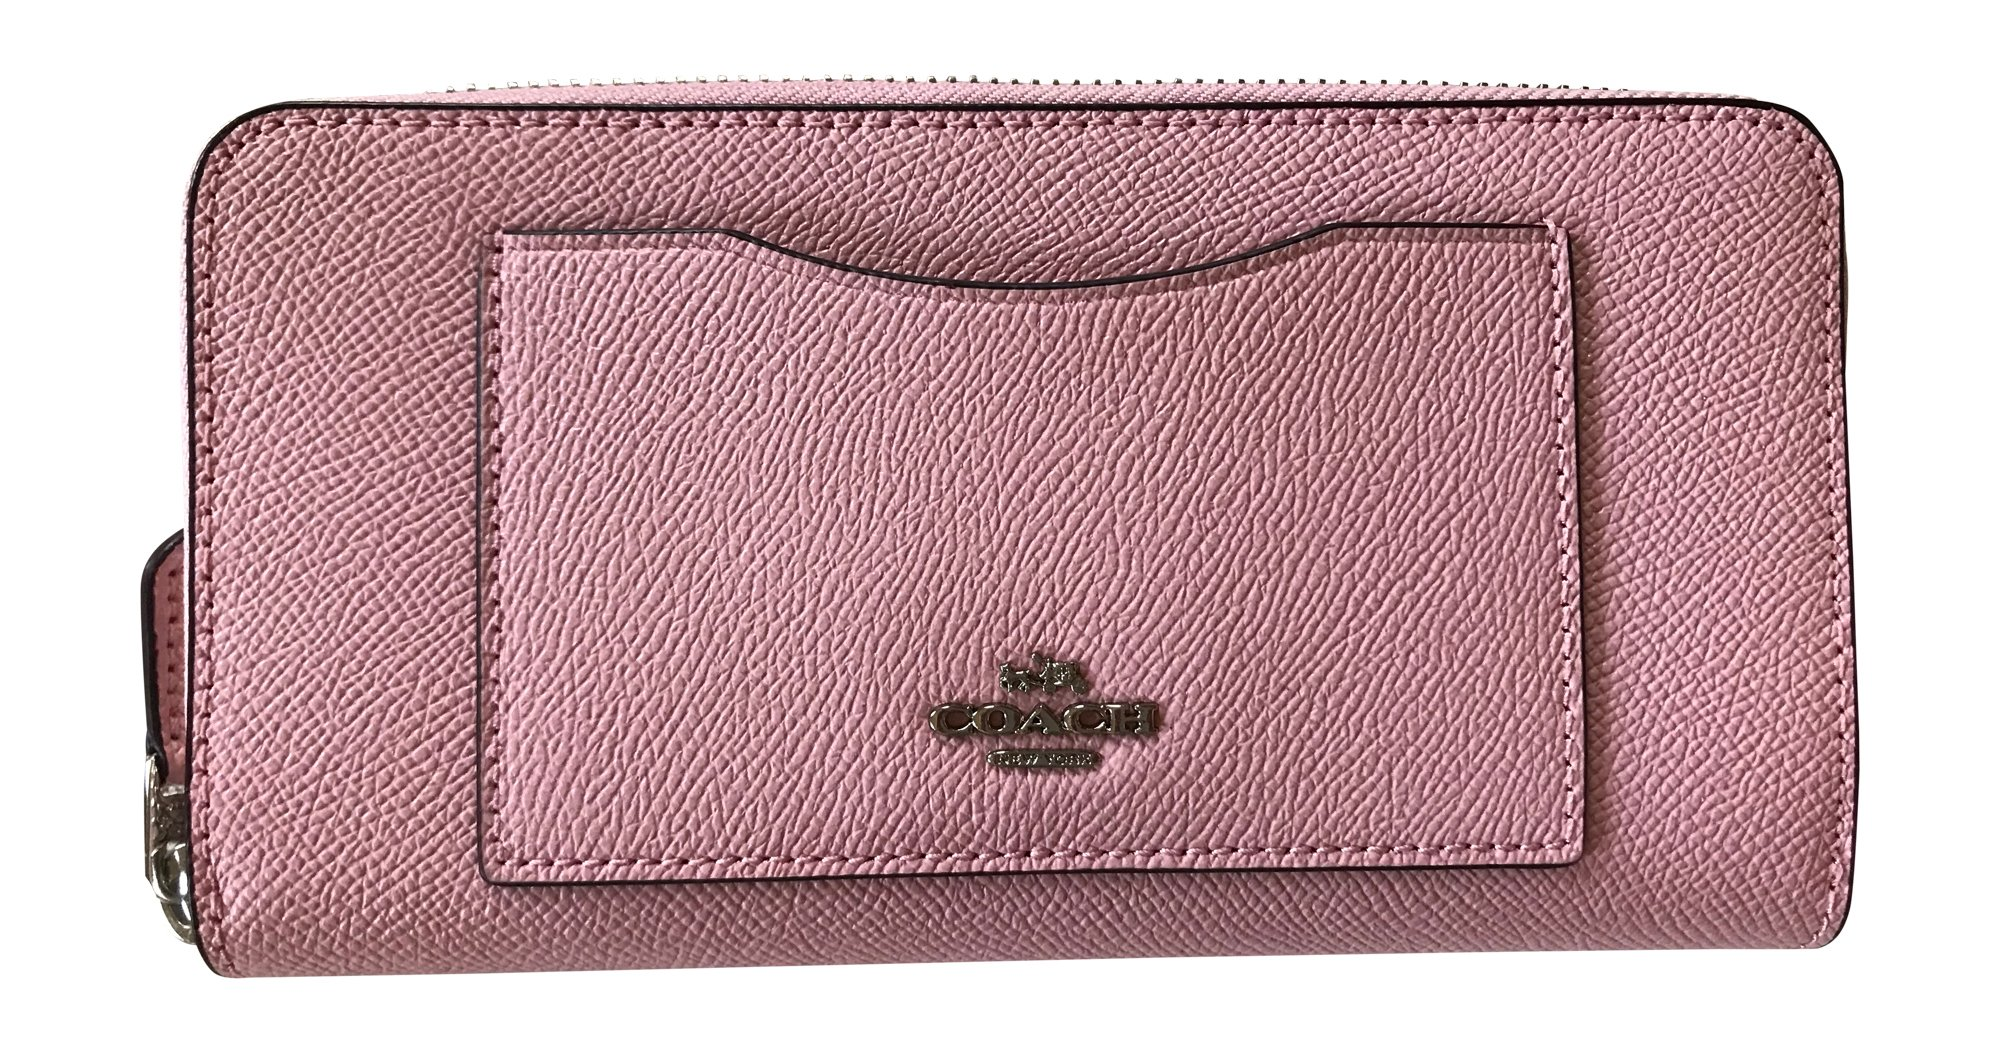 Coach Crossgrain Leather Accordian Zip Wallet, Blush 2